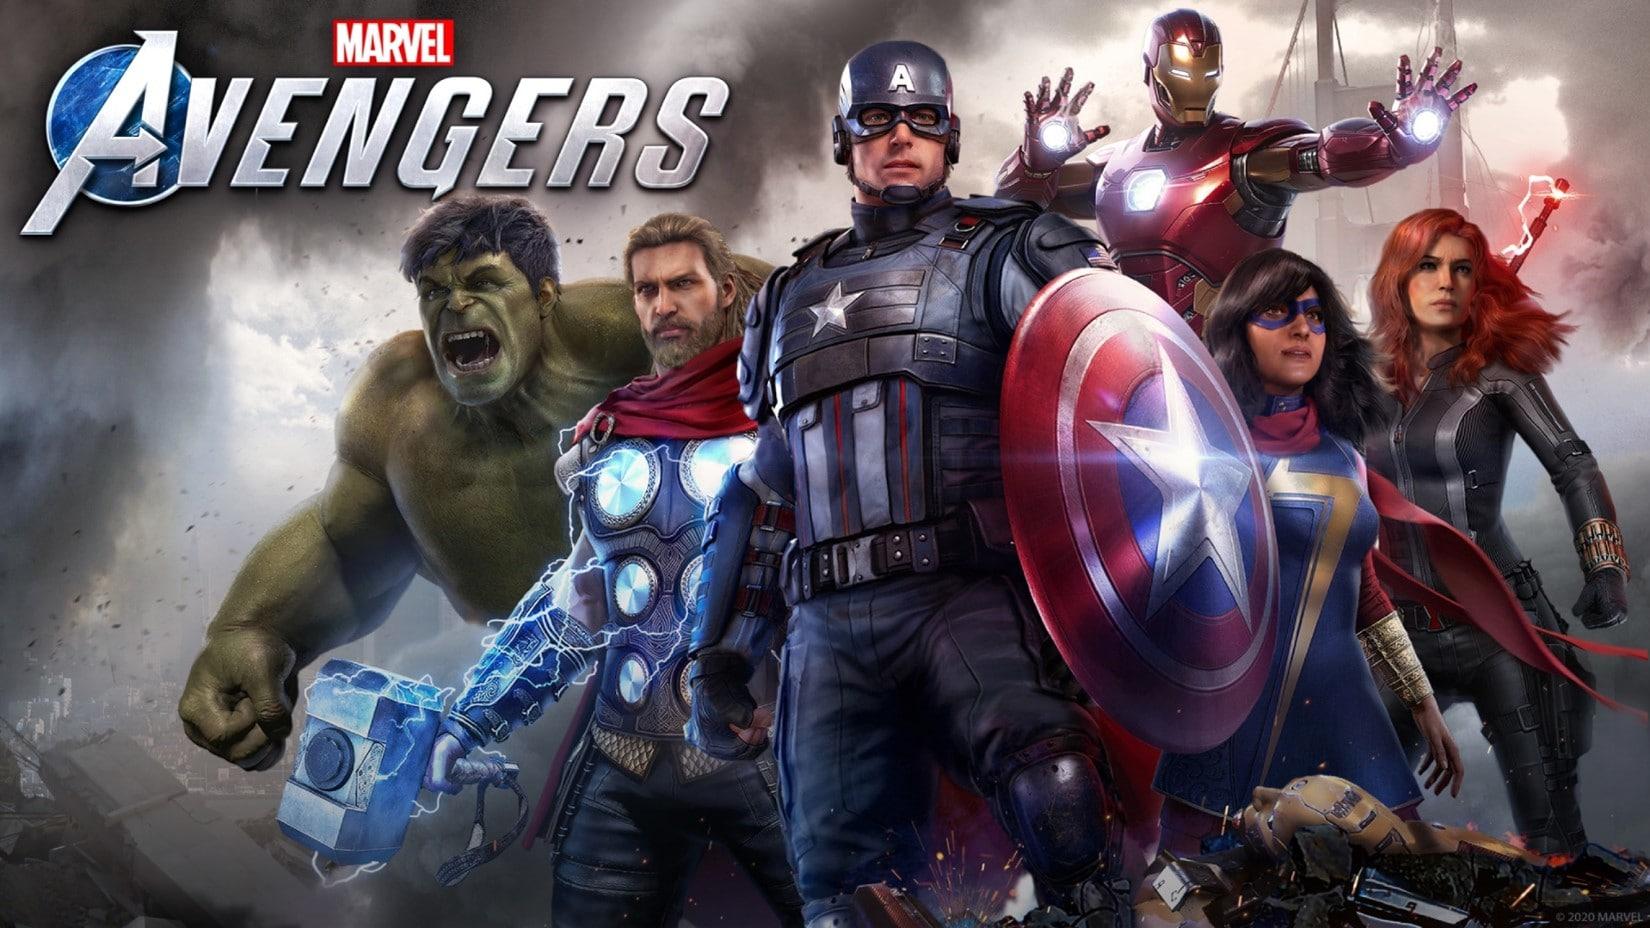 Marvel's Avengers First DLC Delay Announced